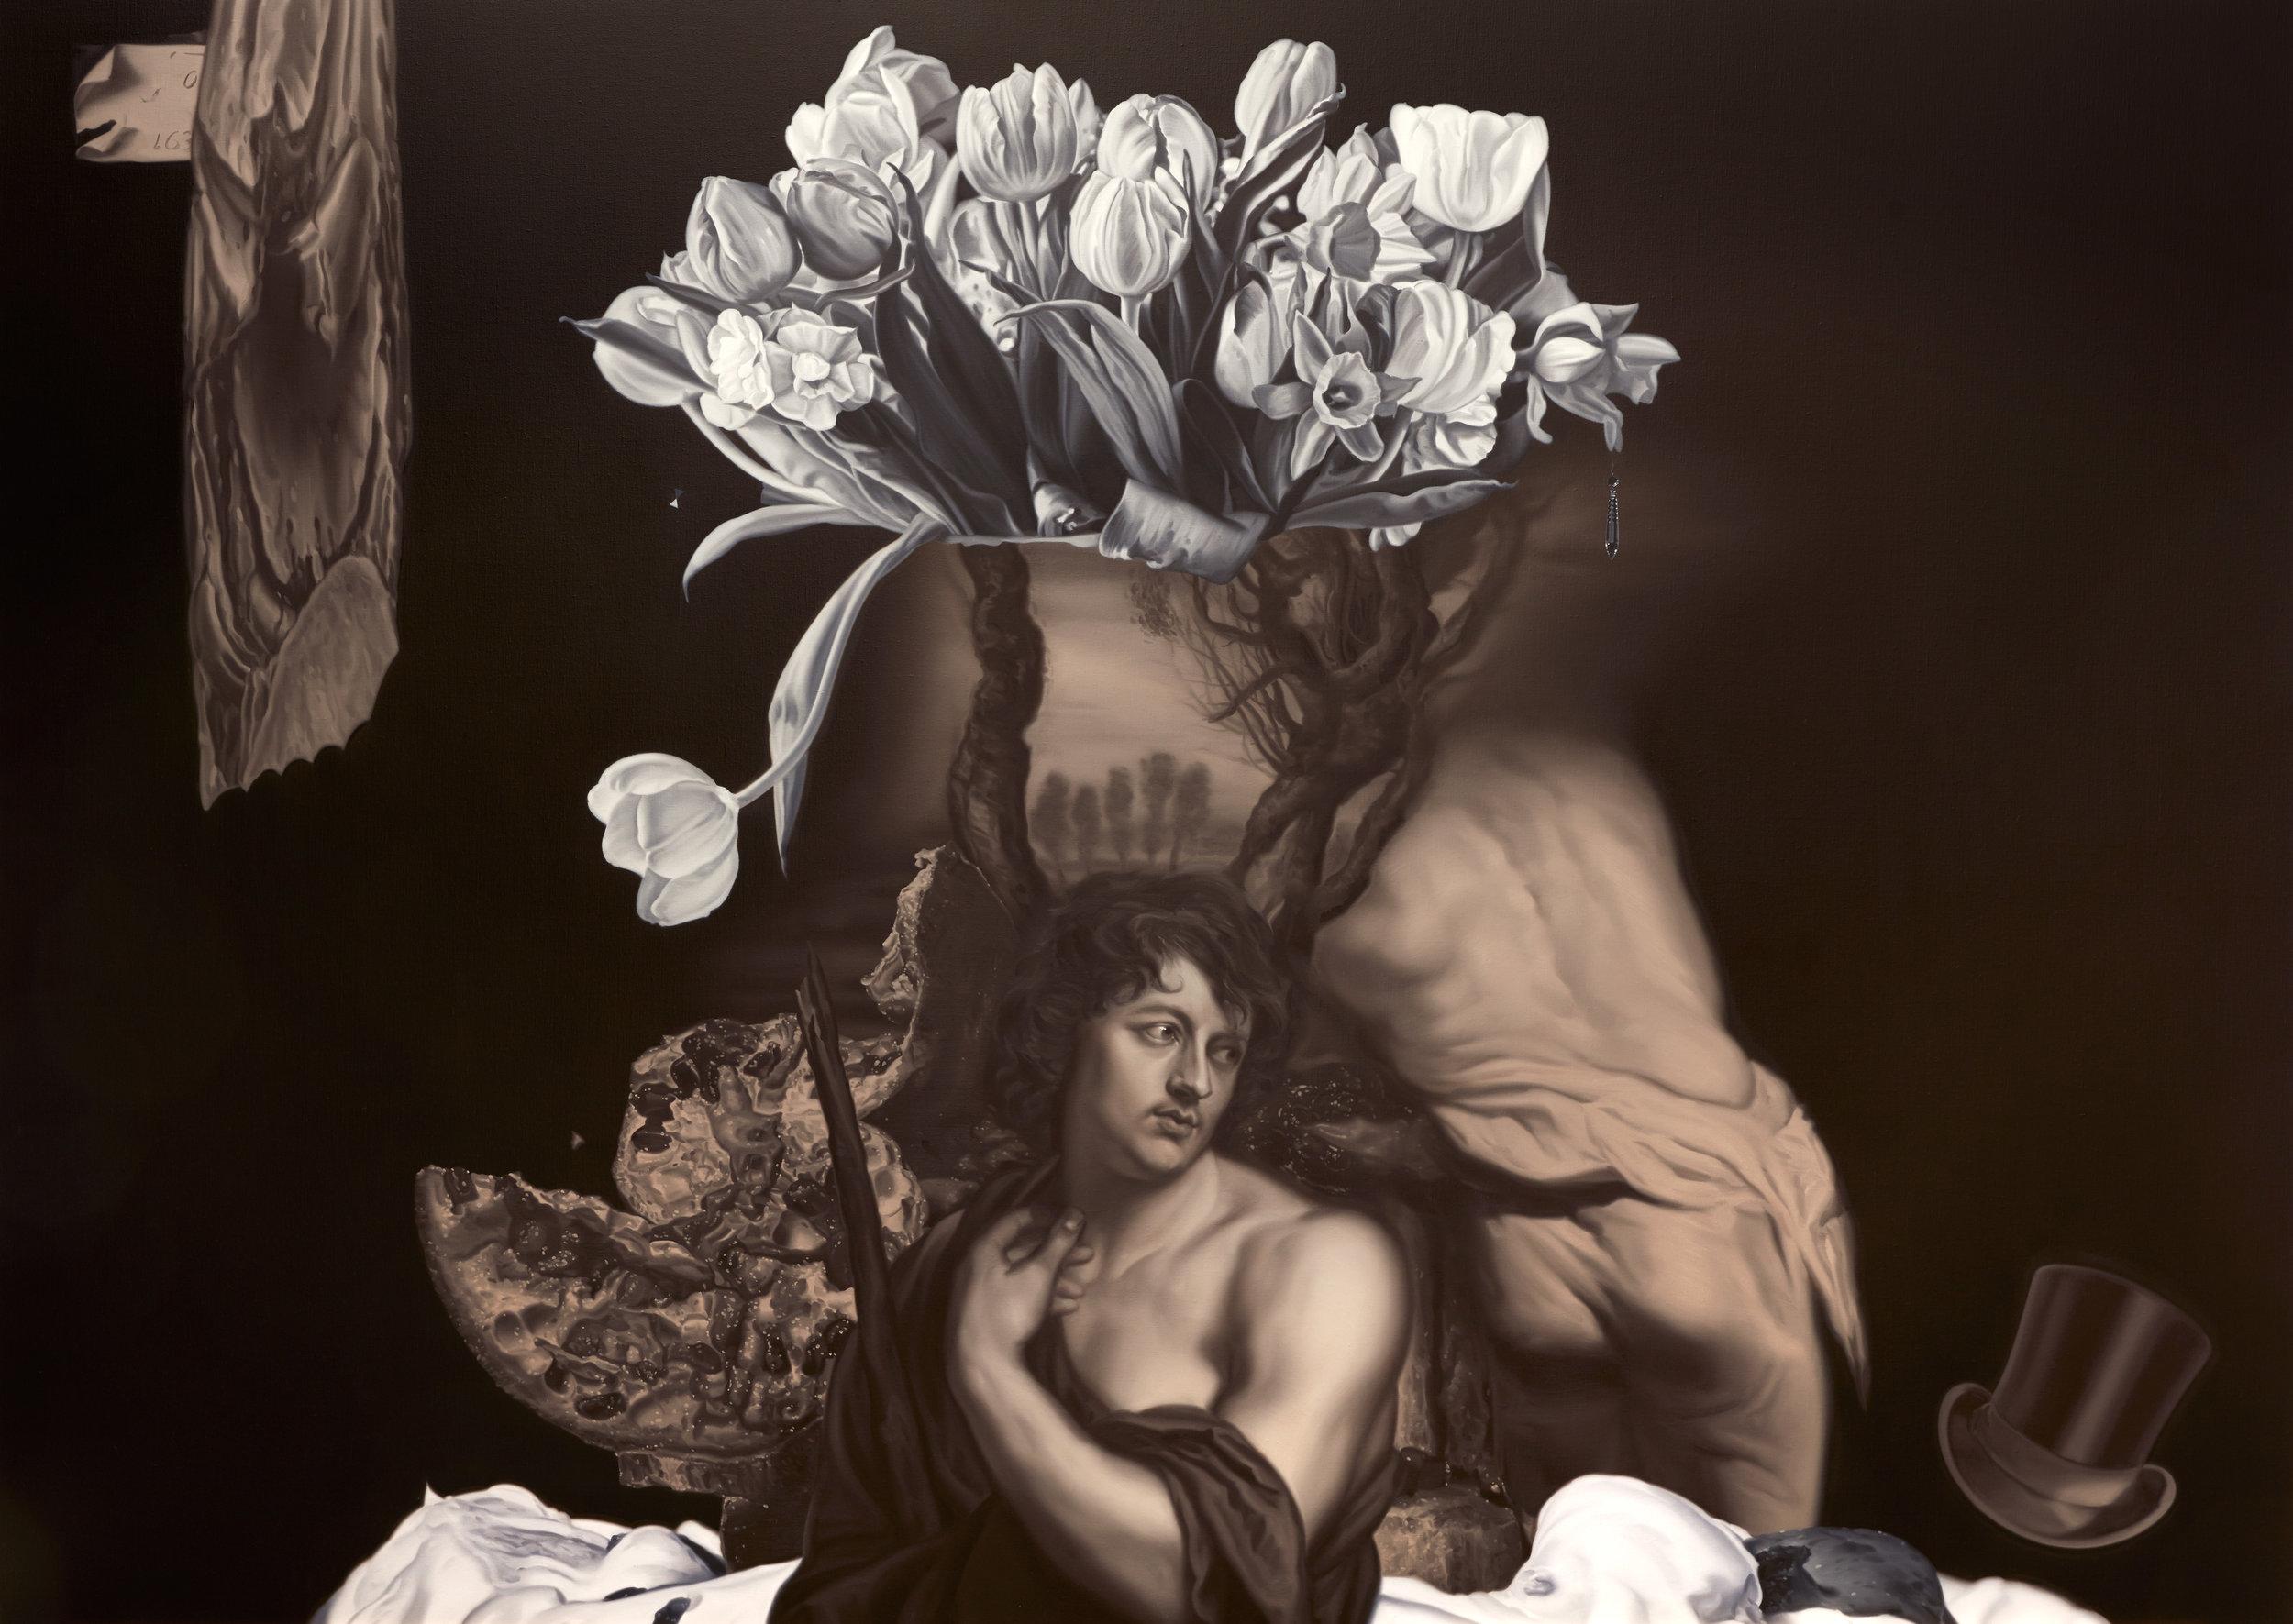 The-Shepherd-Paris,-2016.-Oil-on-canvas-170-x-240-cm-.jpg